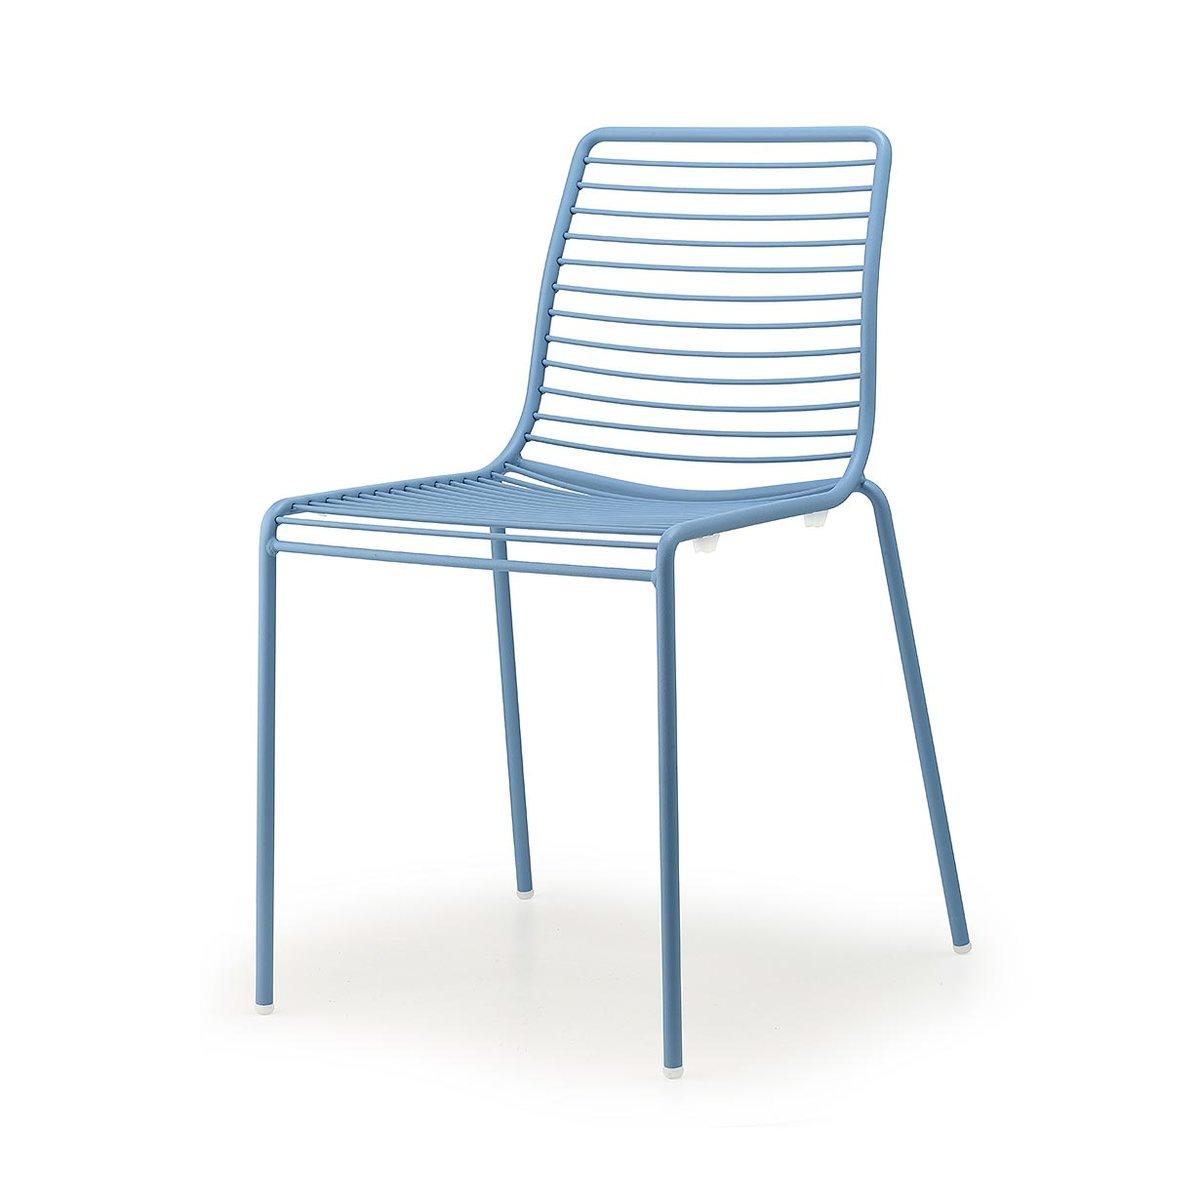 Scab Sedie Da Giardino.2 Sedie Da Esterno Summer By Scab Design Lovethesign